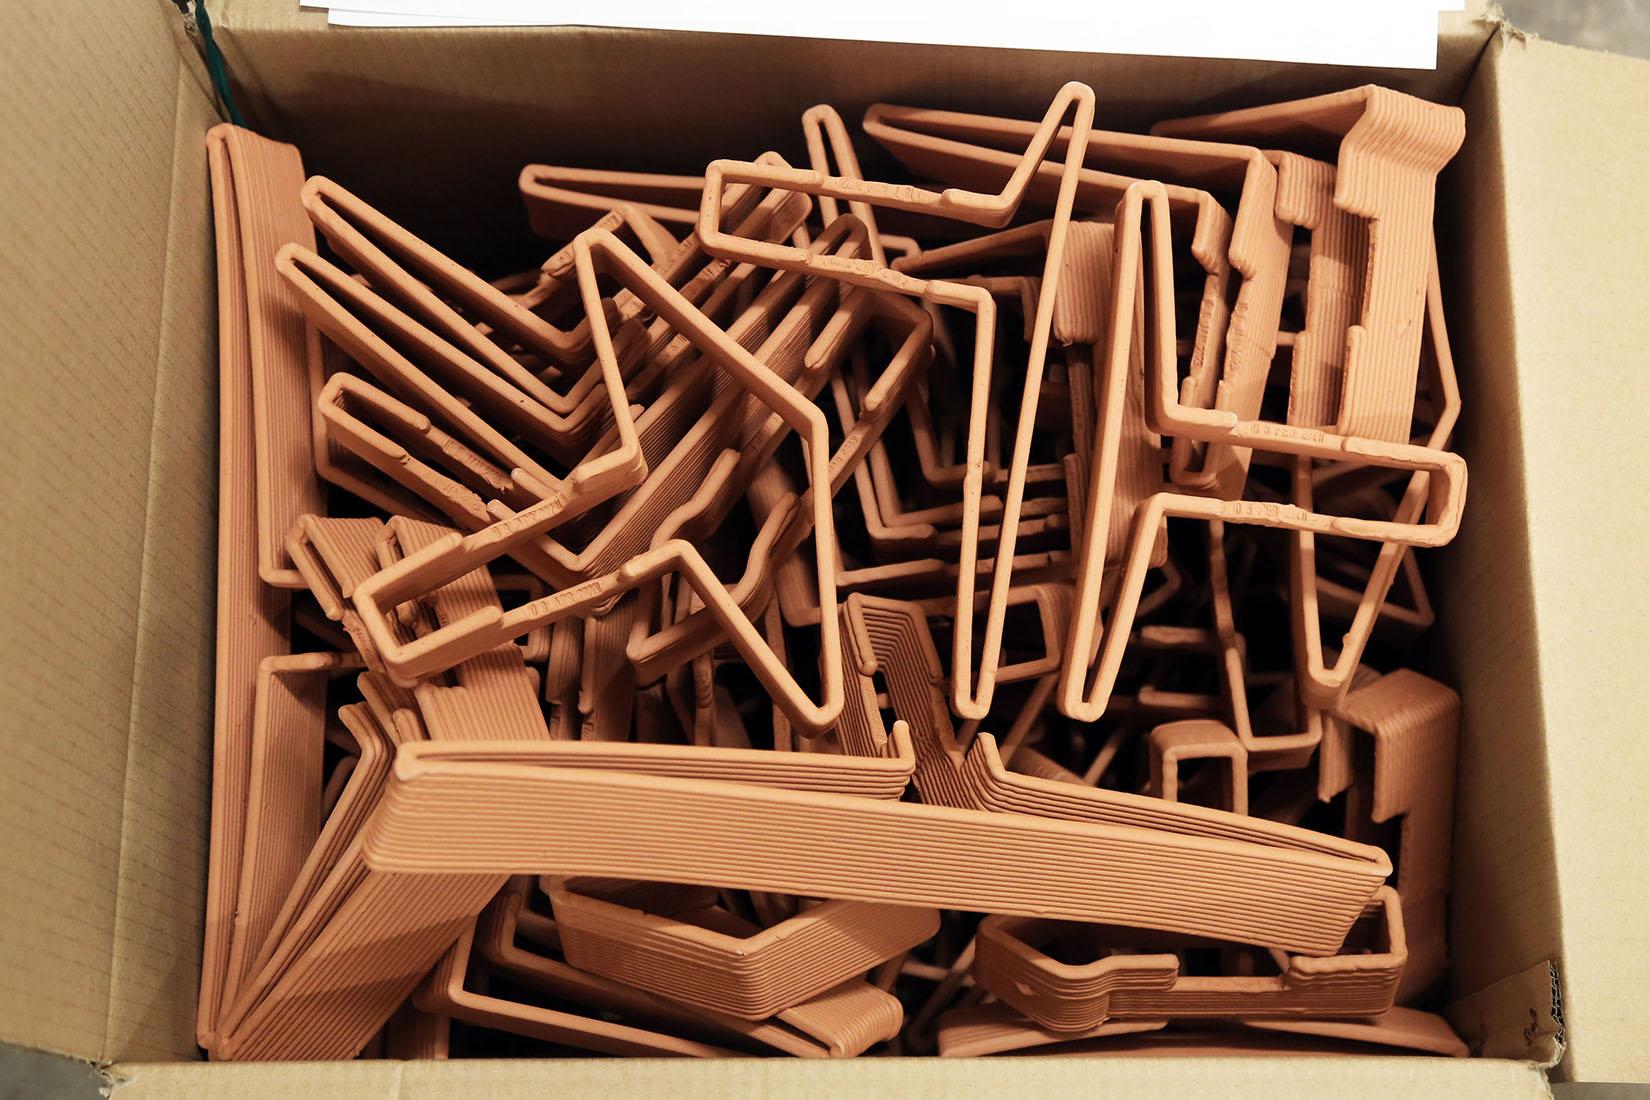 robotically fabricated terracotta bricks